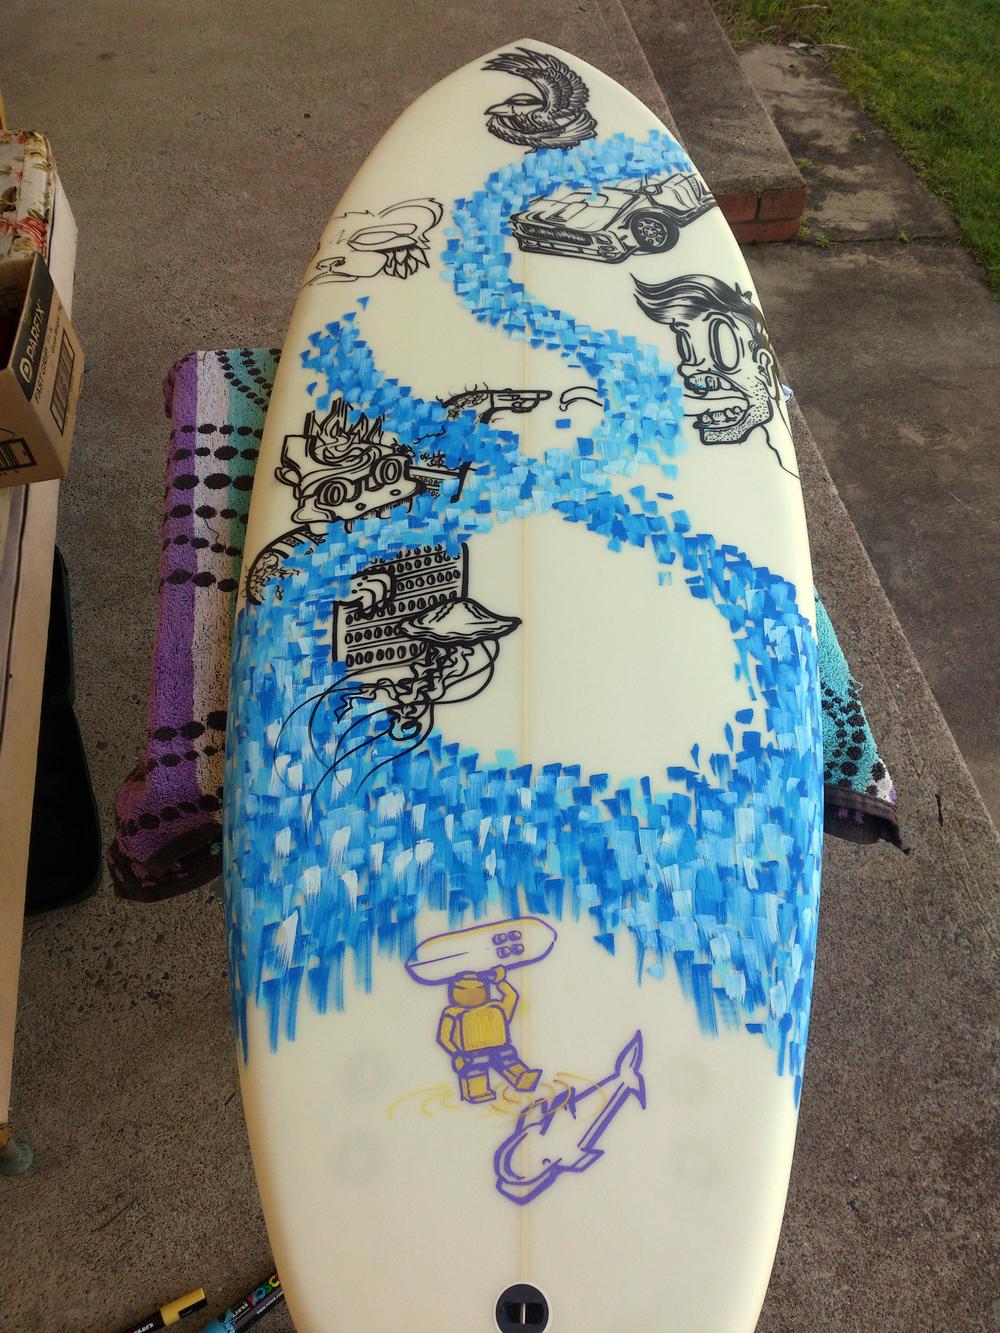 process-painting-paint-custom-design-surfboard-surfing-handmande-handpainted-surfing-sam-shennan-ud3.jpg